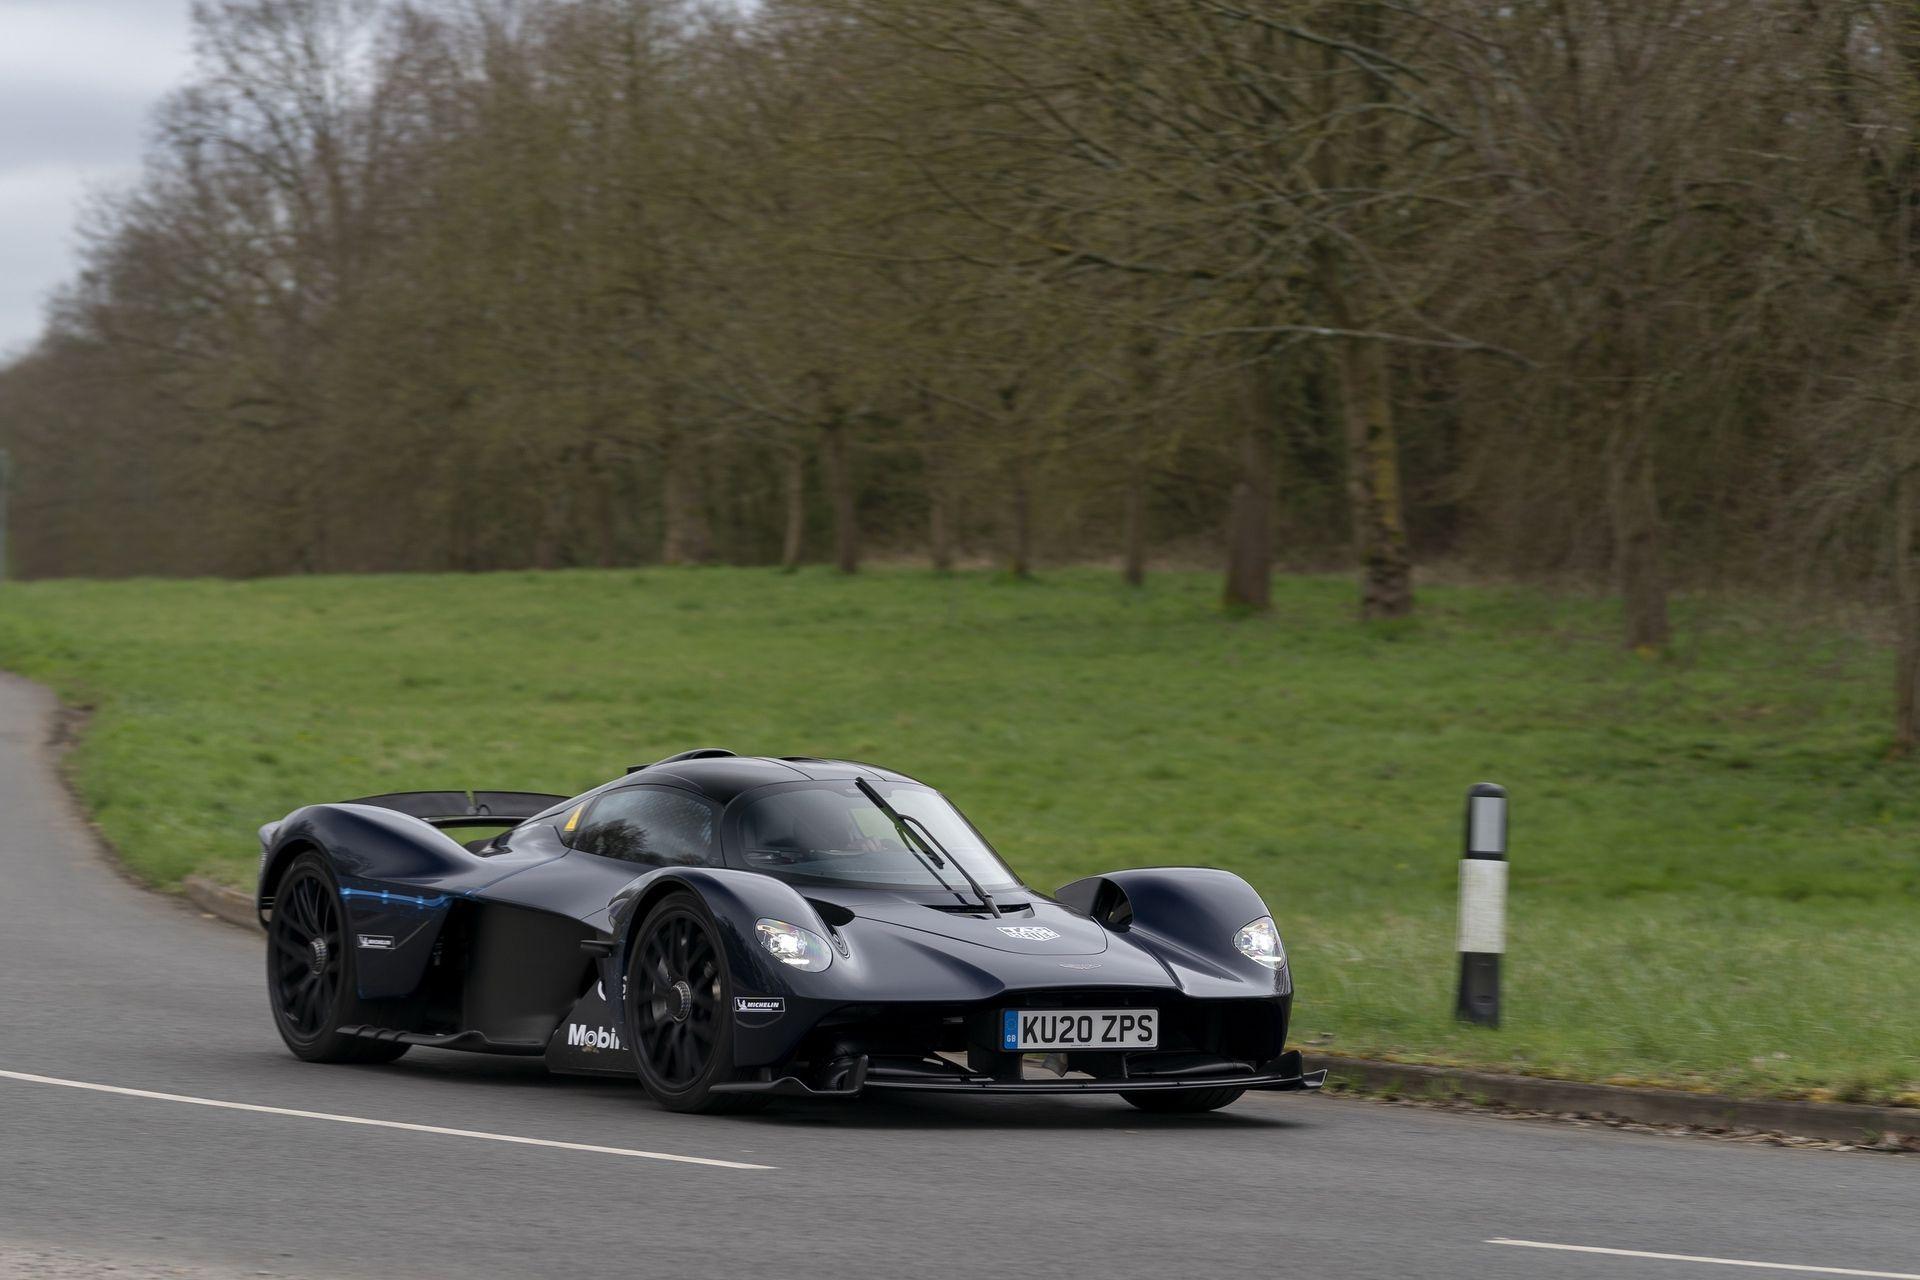 Aston_Martin_Valkyrie_public_roads_0004